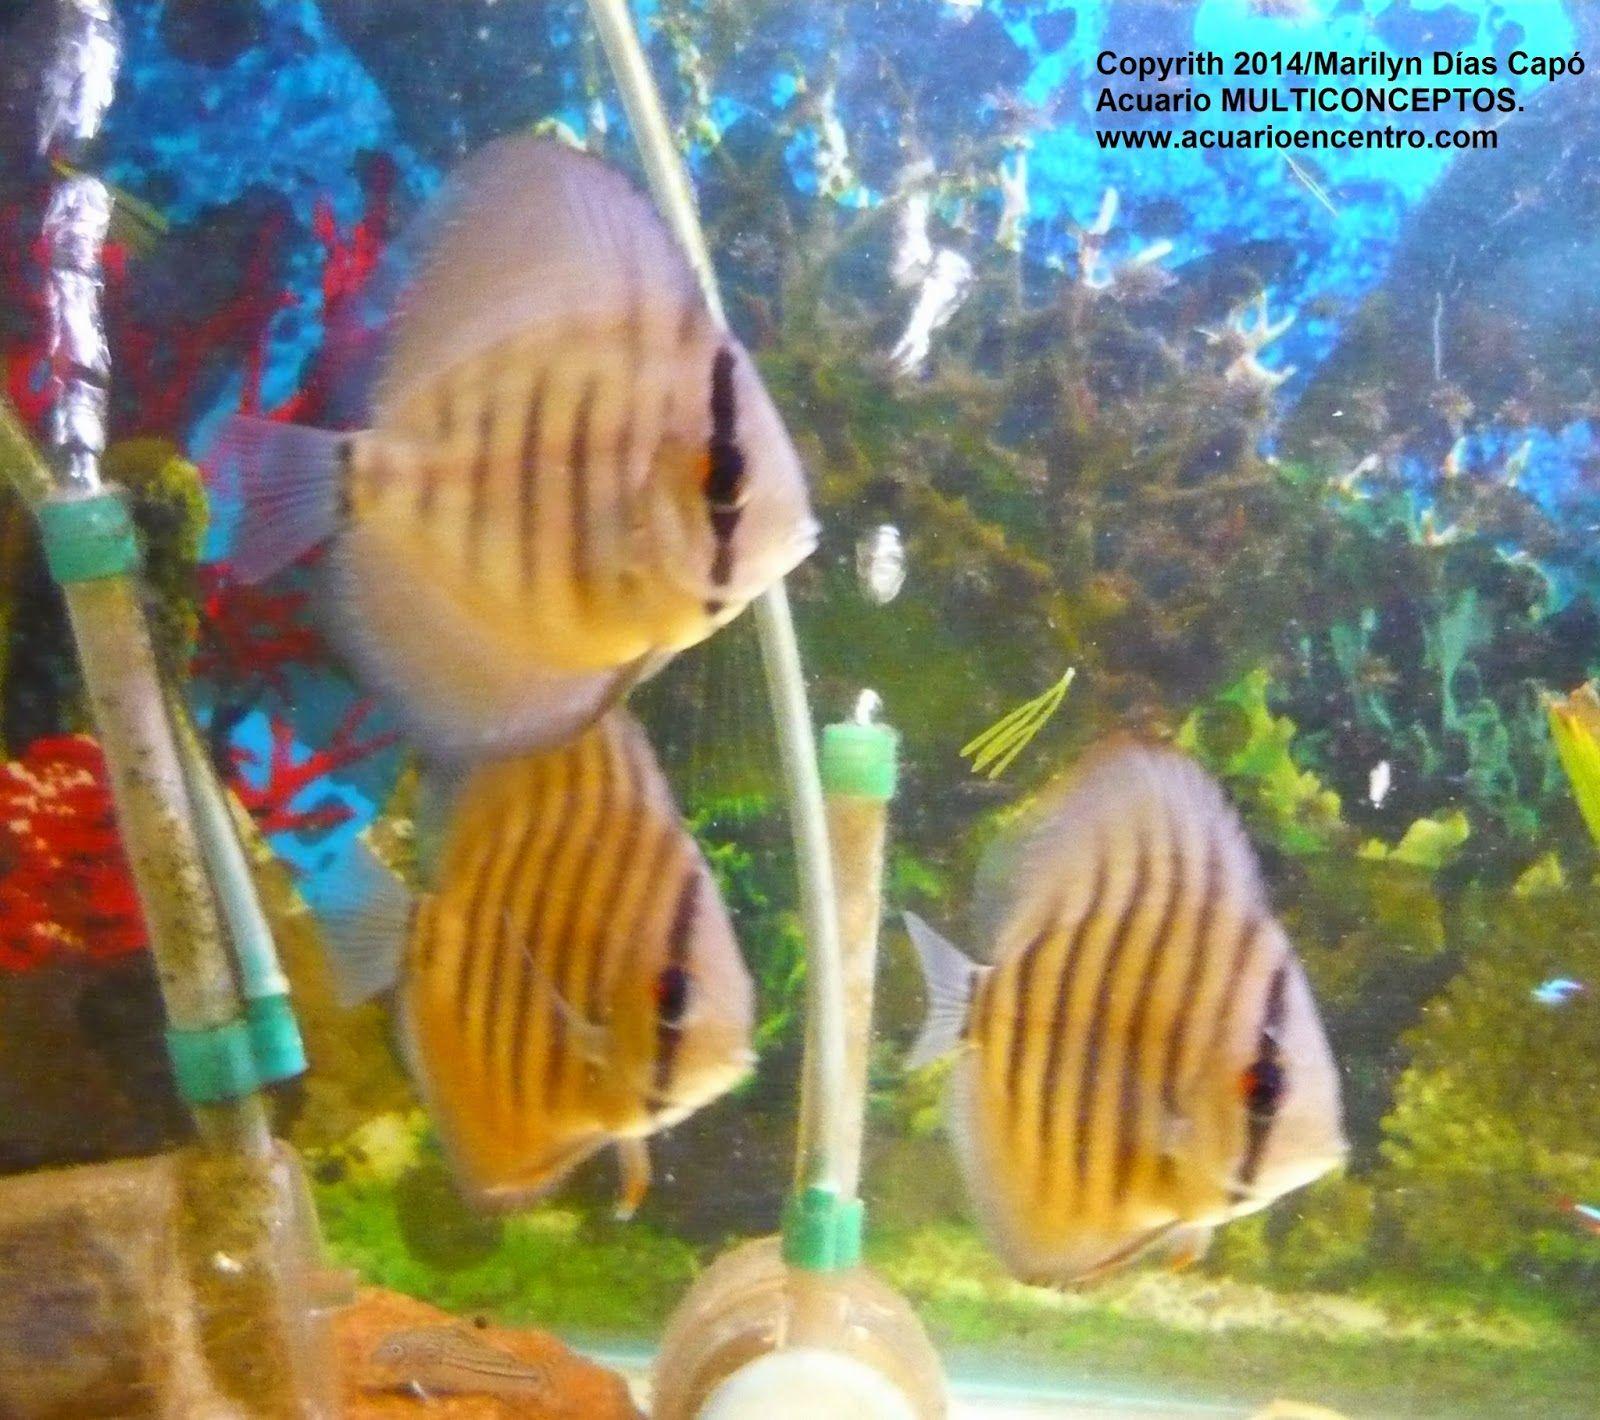 especies de peces tropicales peces tropicales de agua dulce mis peces en